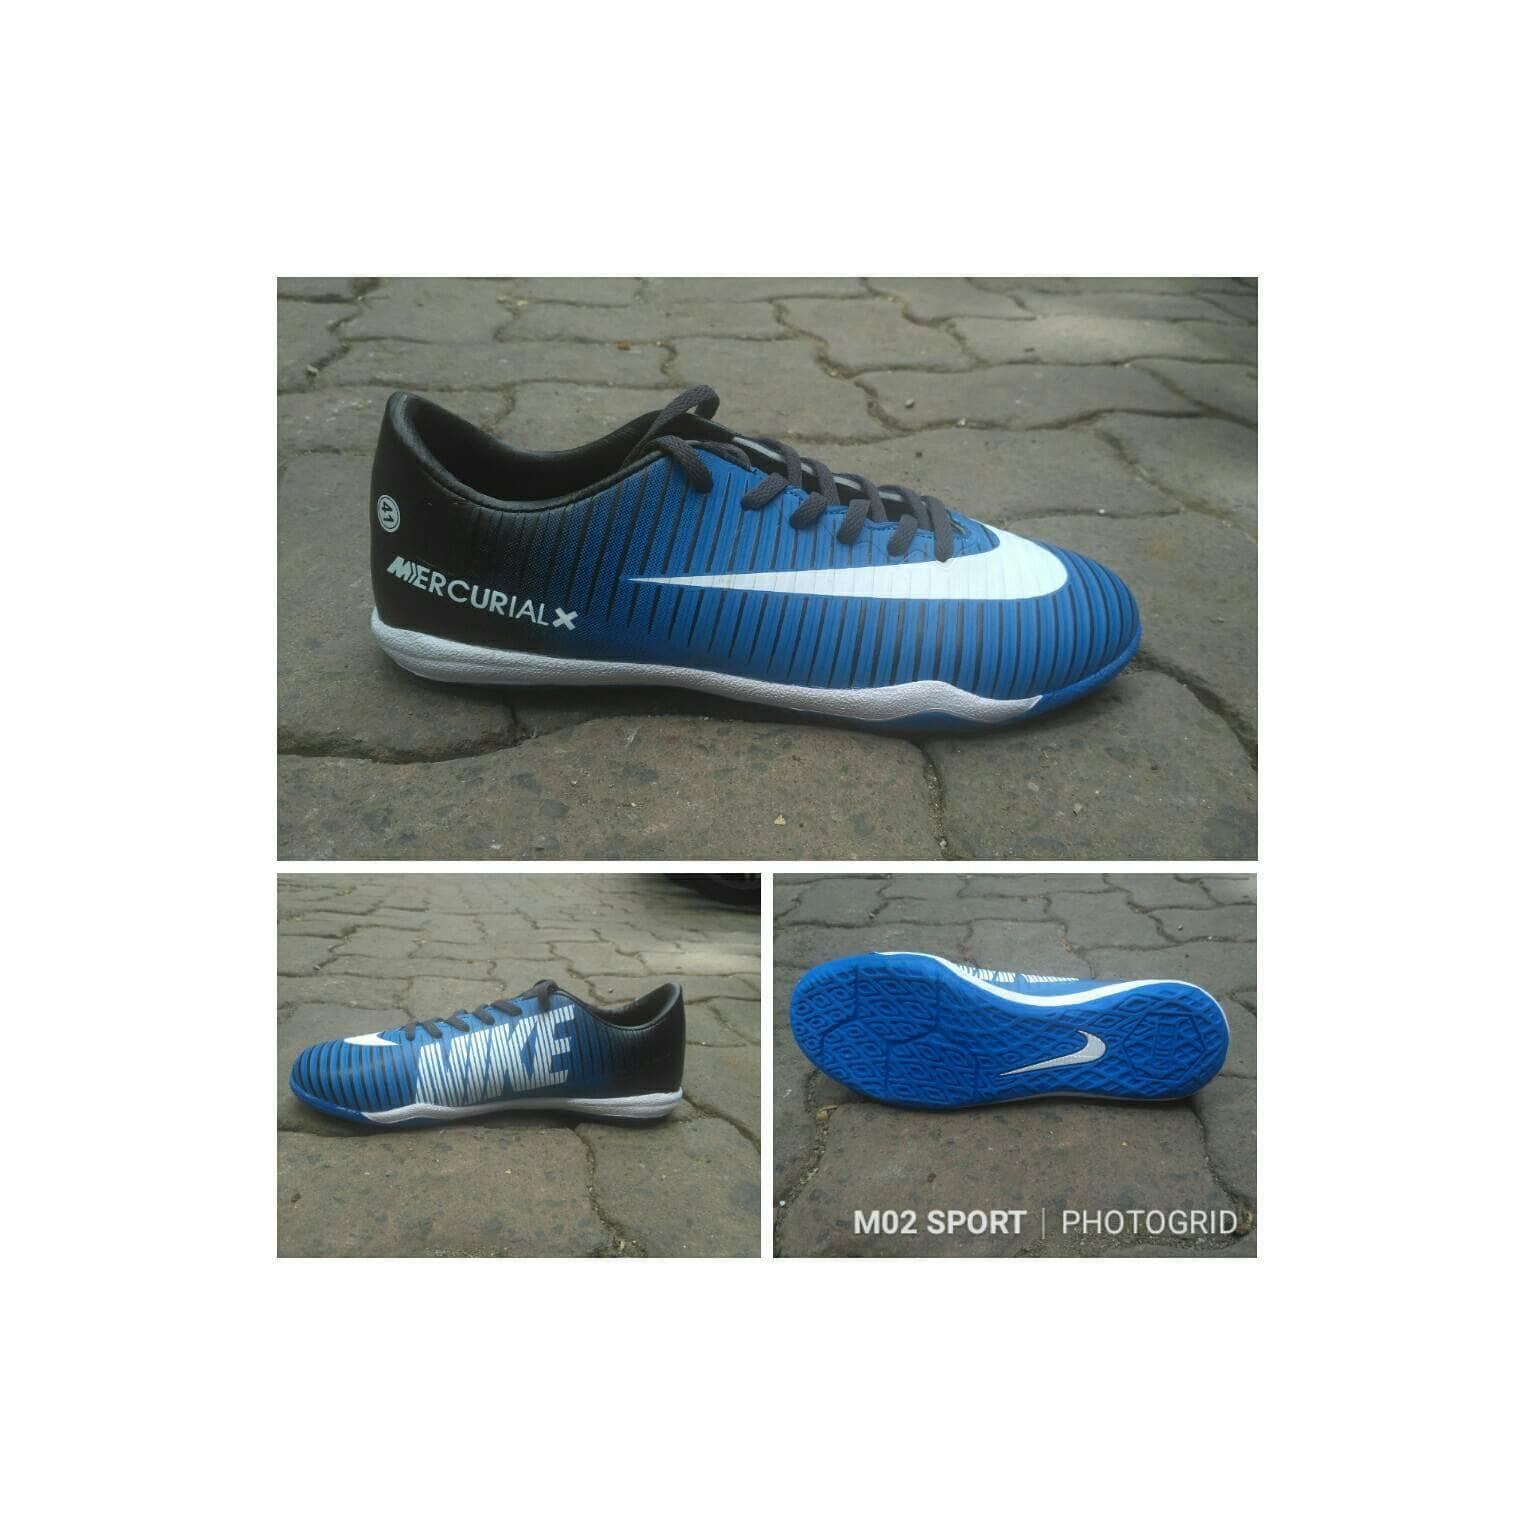 Sepatu futsal nike mercurial X hitam kombinasi biru sol karet